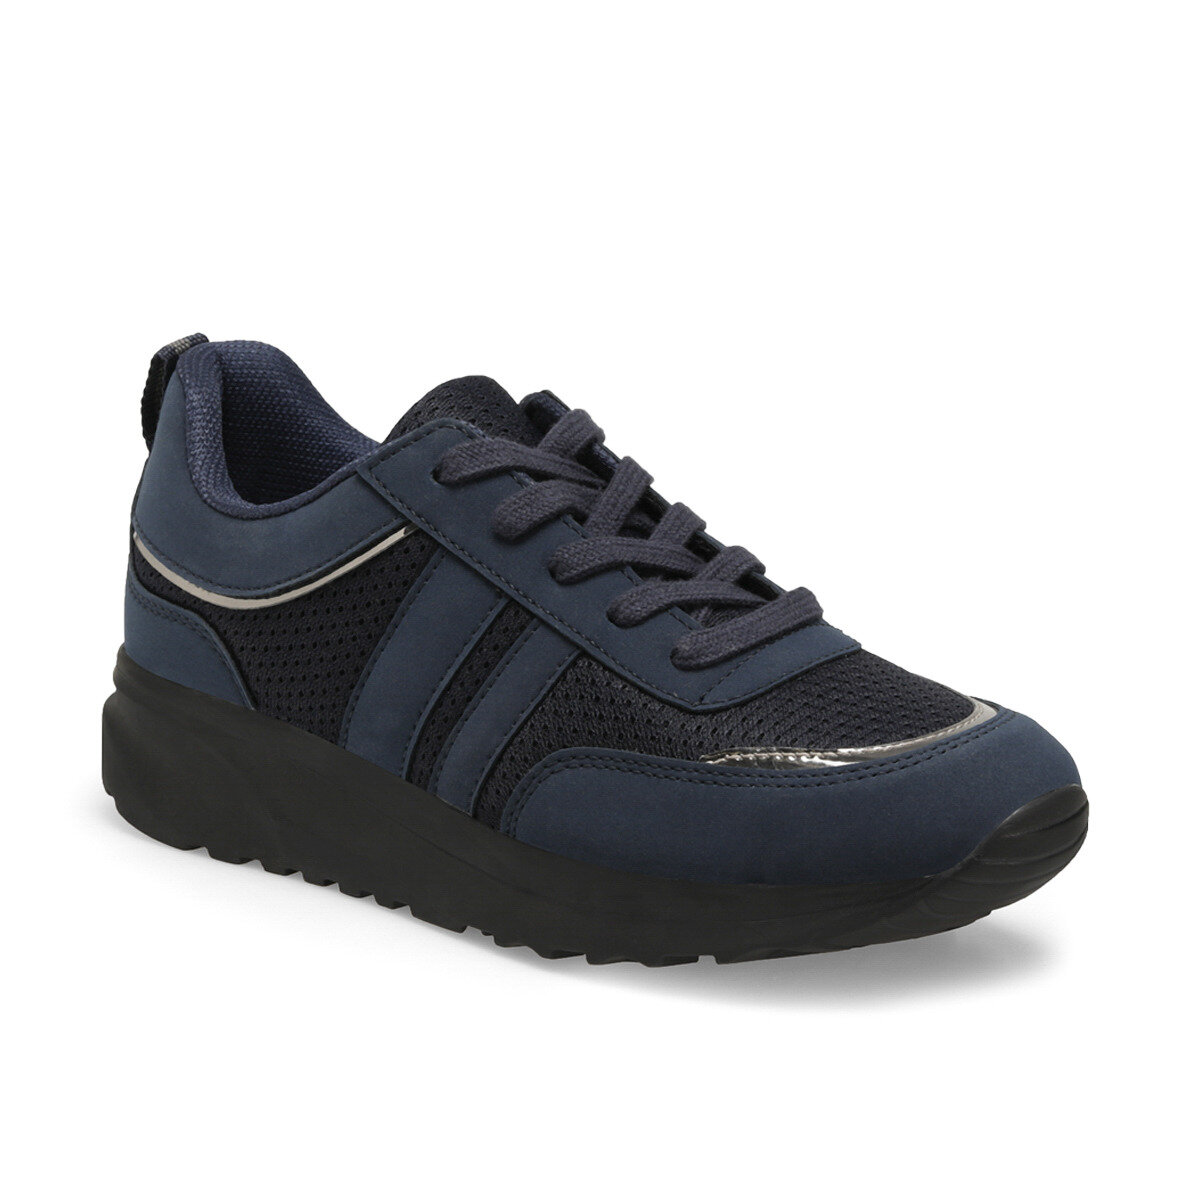 FLO CS18064-19S Navy Blue Women 'S Sports Shoes Art Bella